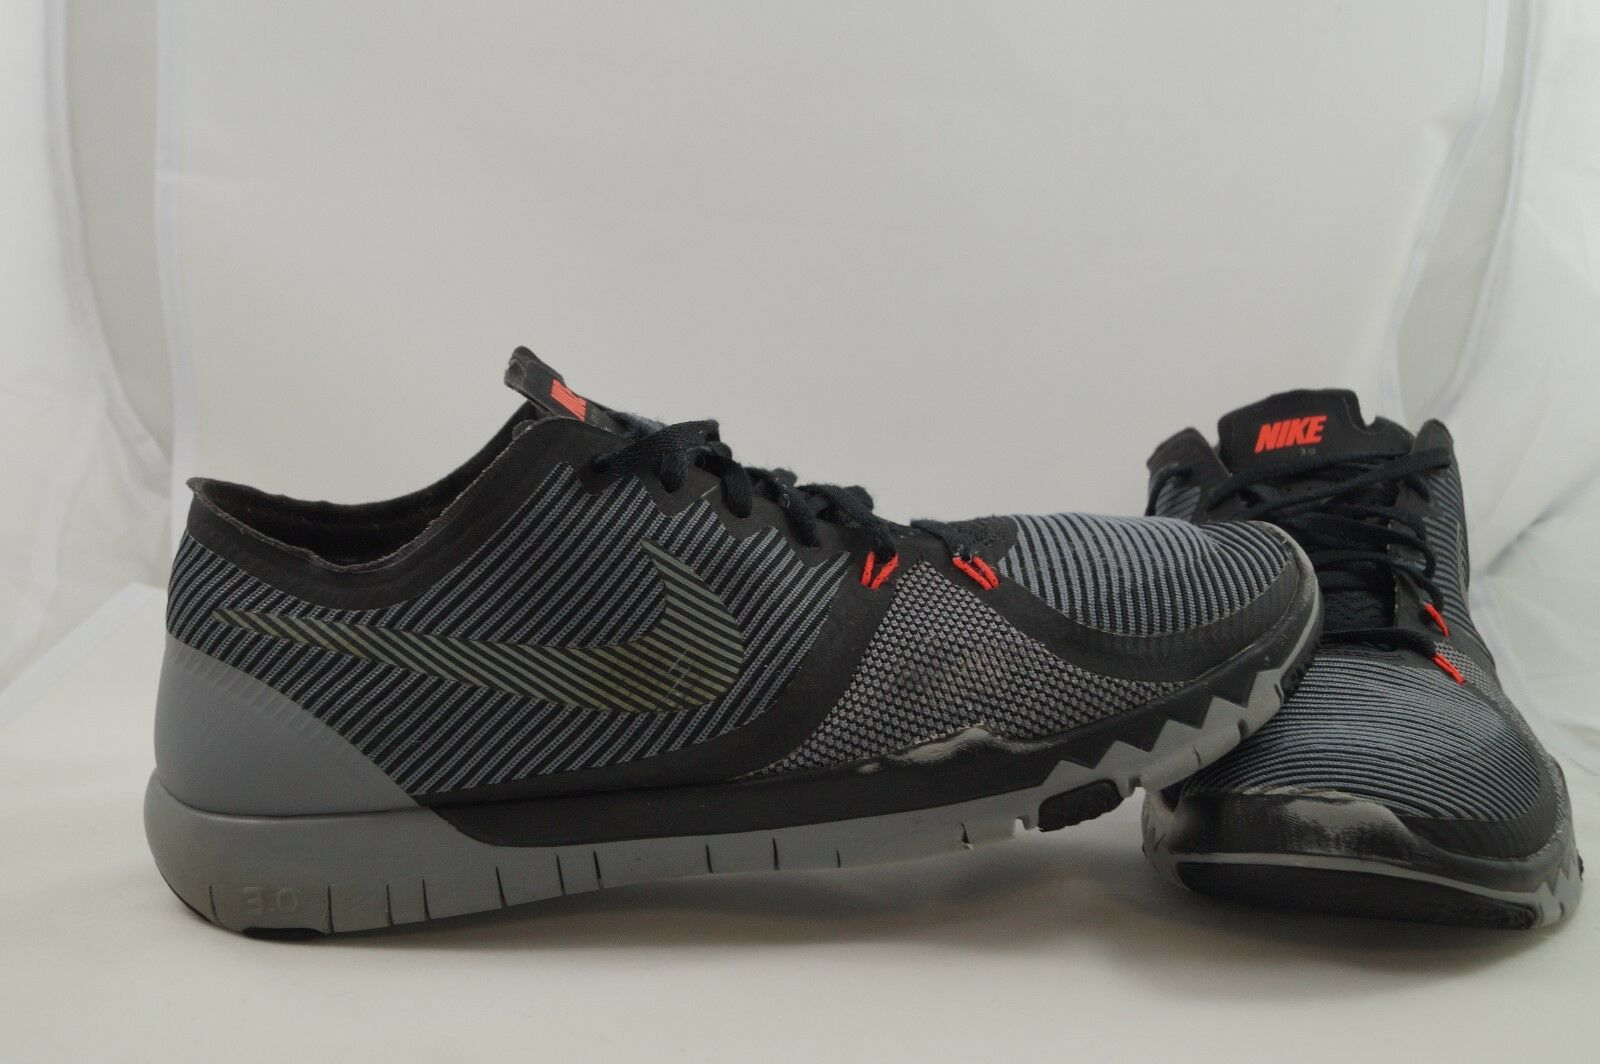 Nike Free 3.0 v4 Trainers UE 45 us 11 UK 10 negro 749361-001 zapatillas deportivas